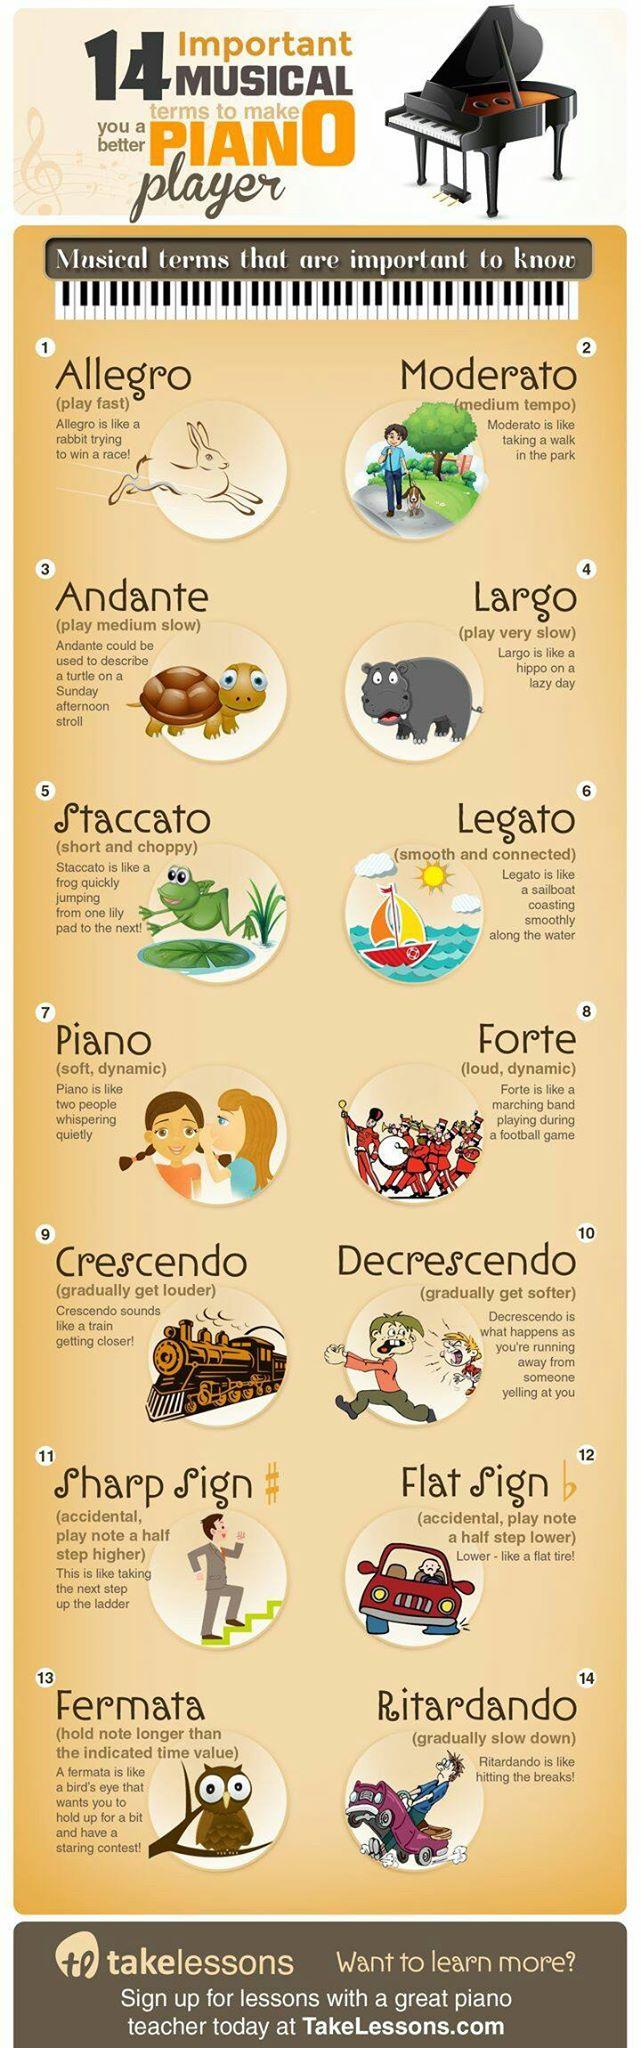 Musical Terms.jpg